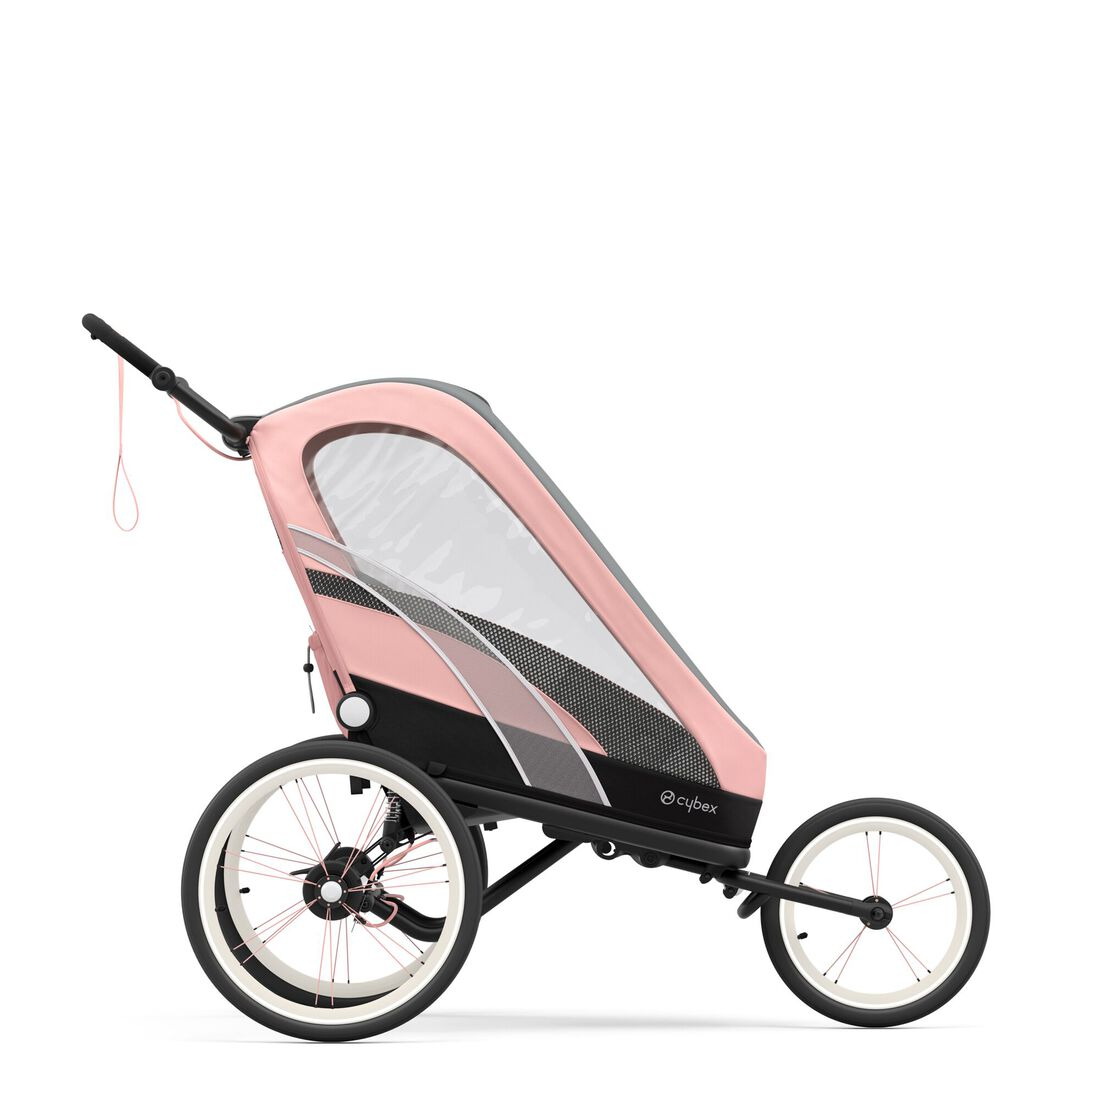 CYBEX Zeno Sitzpaket - Silver Pink in Silver Pink large Bild 4